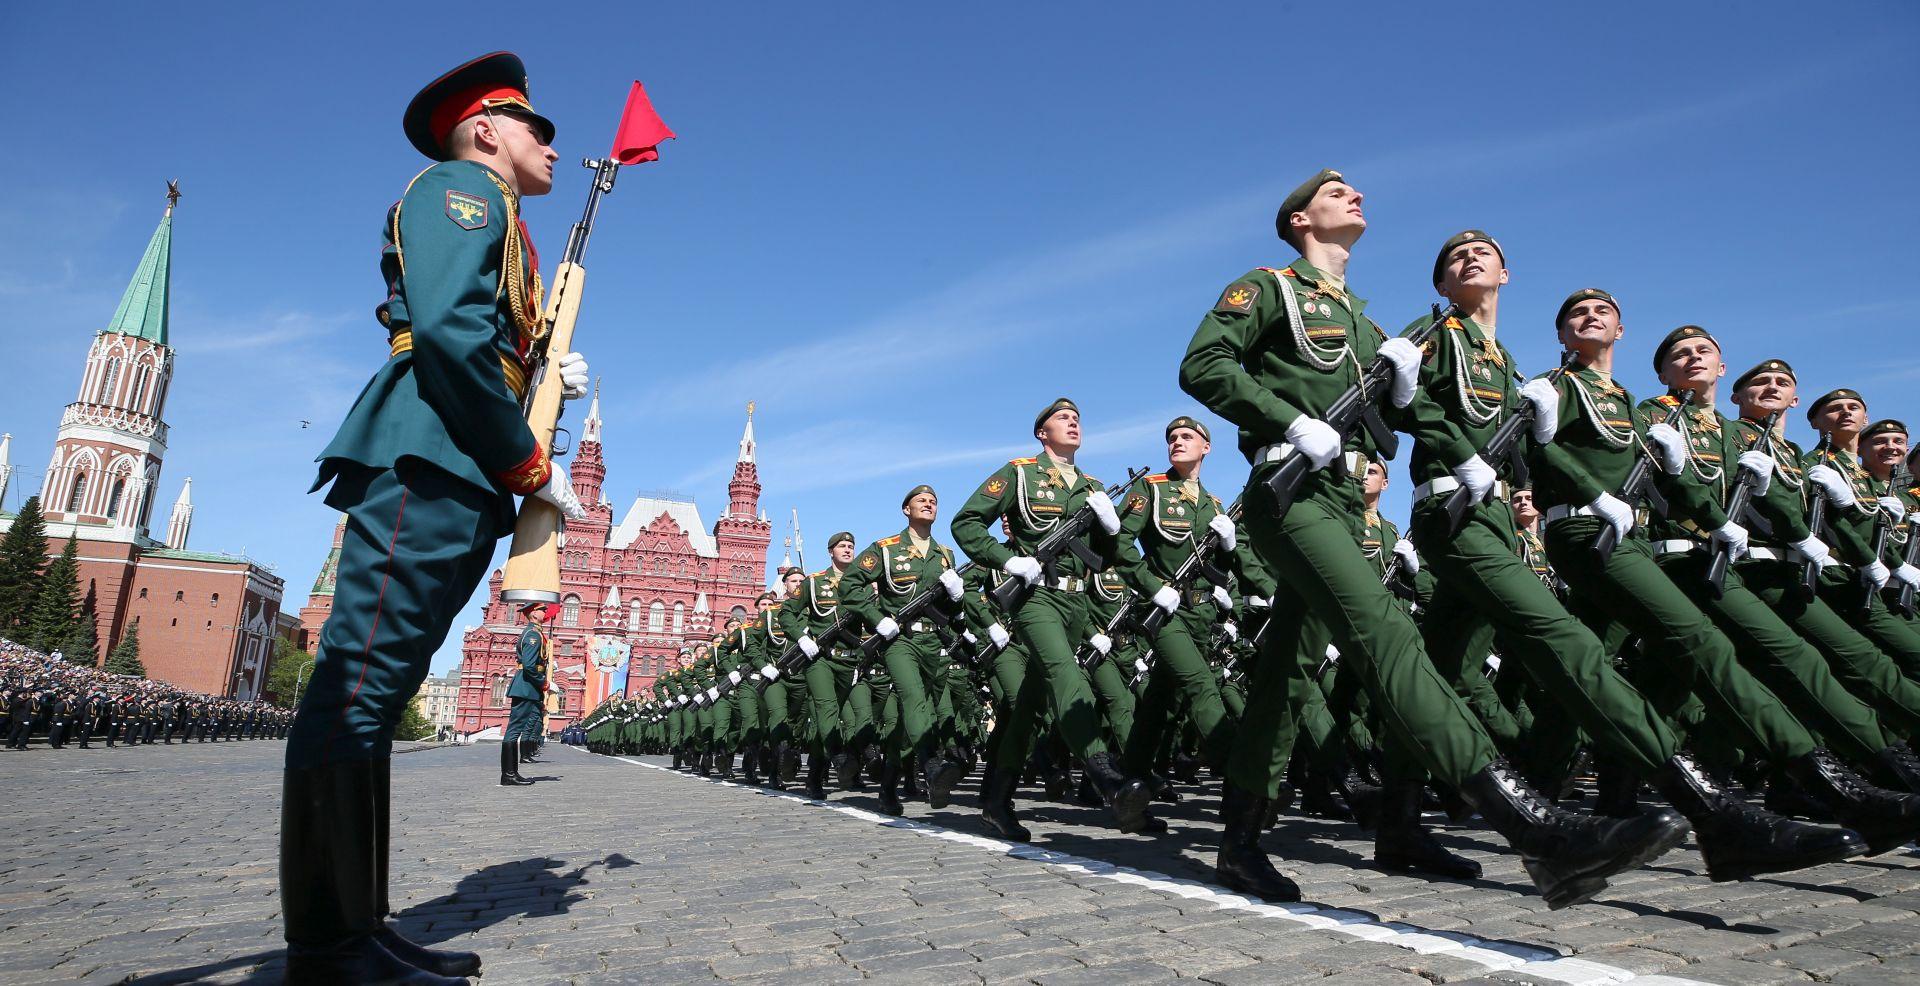 Rusija vojnom paradom proslavila pobjedu nad nacističkom Njemačkom